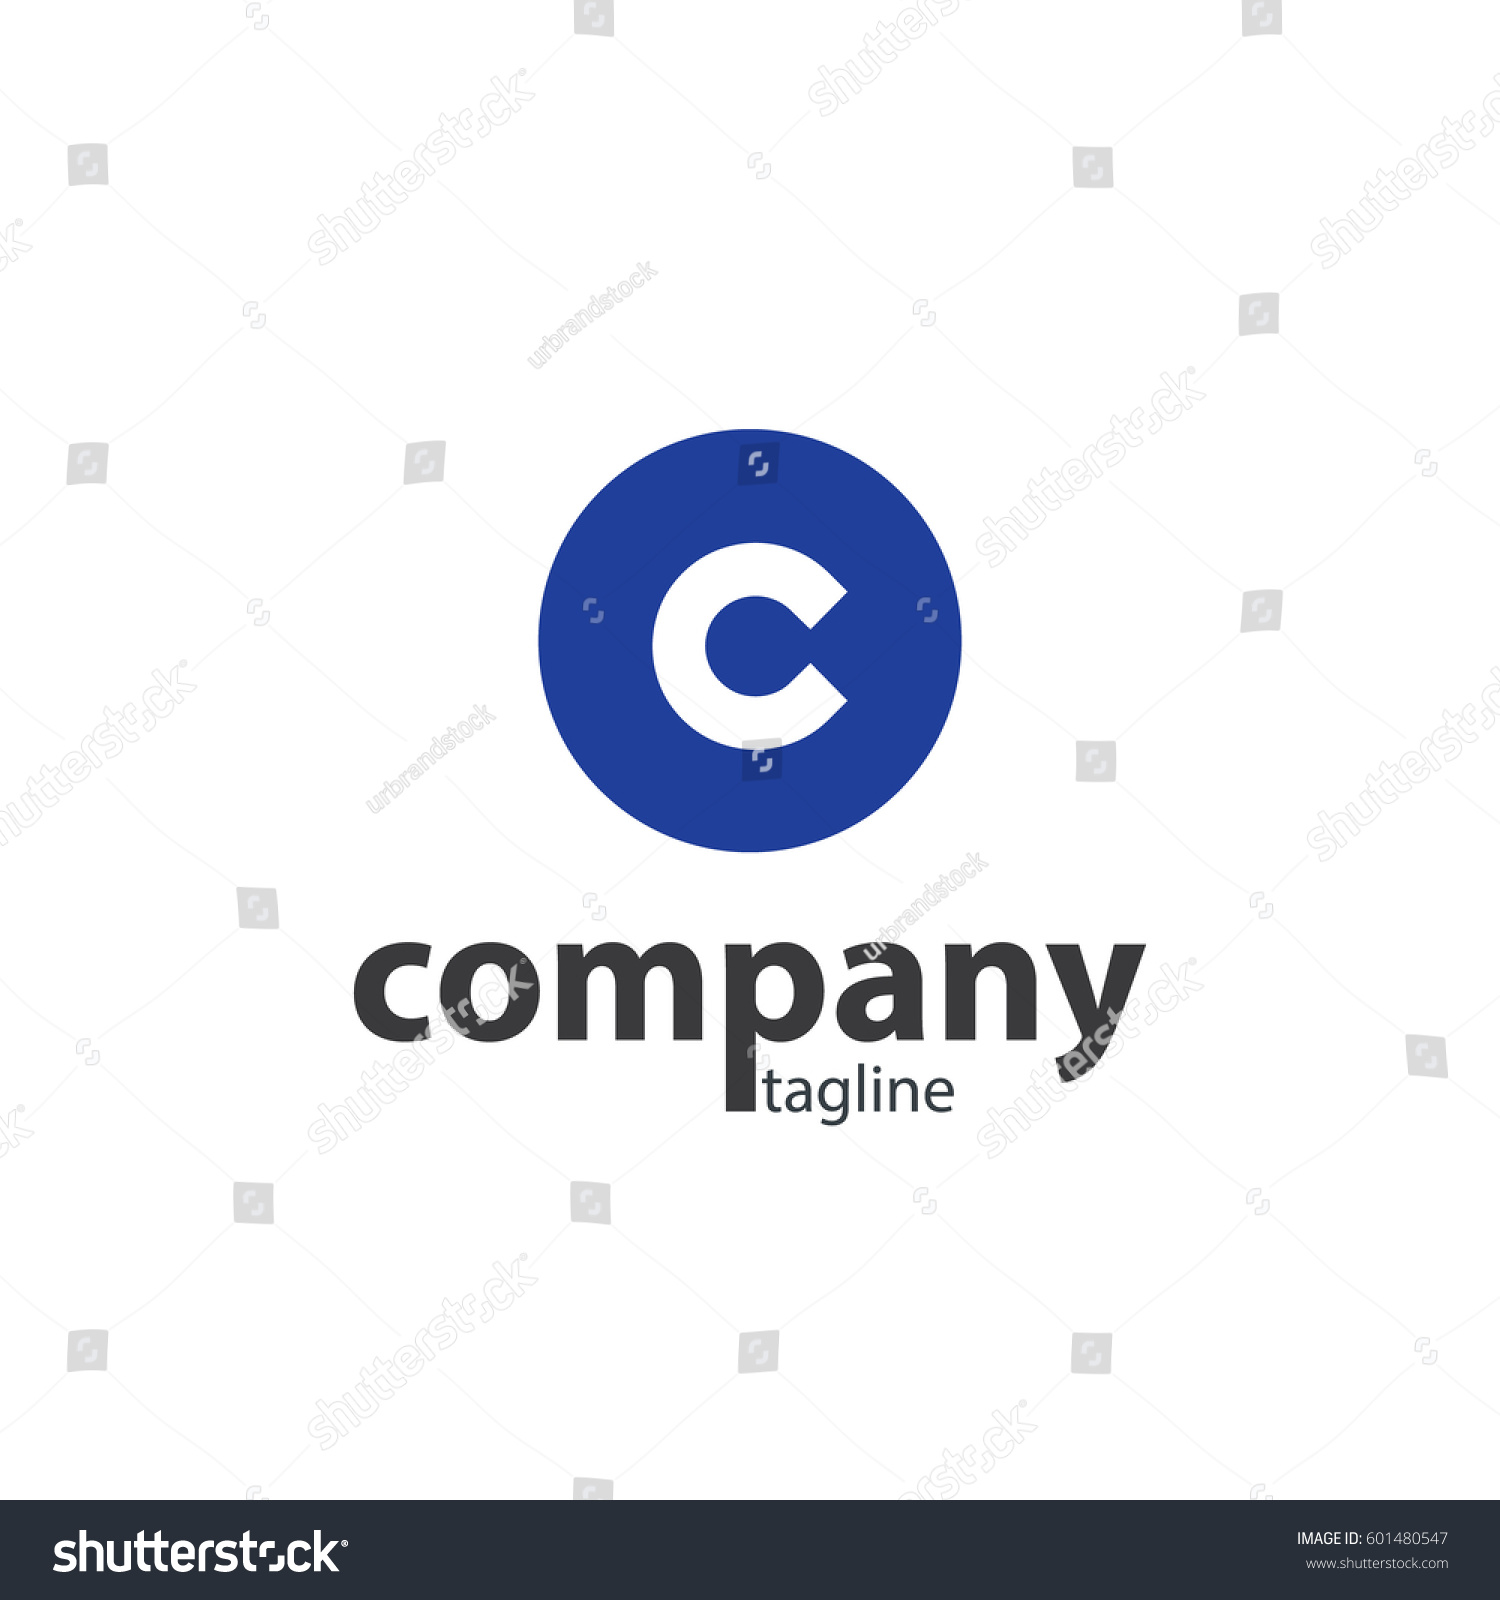 Initial letter c circle design logo stock vector 601480547 initial letter c with circle design logo biocorpaavc Images